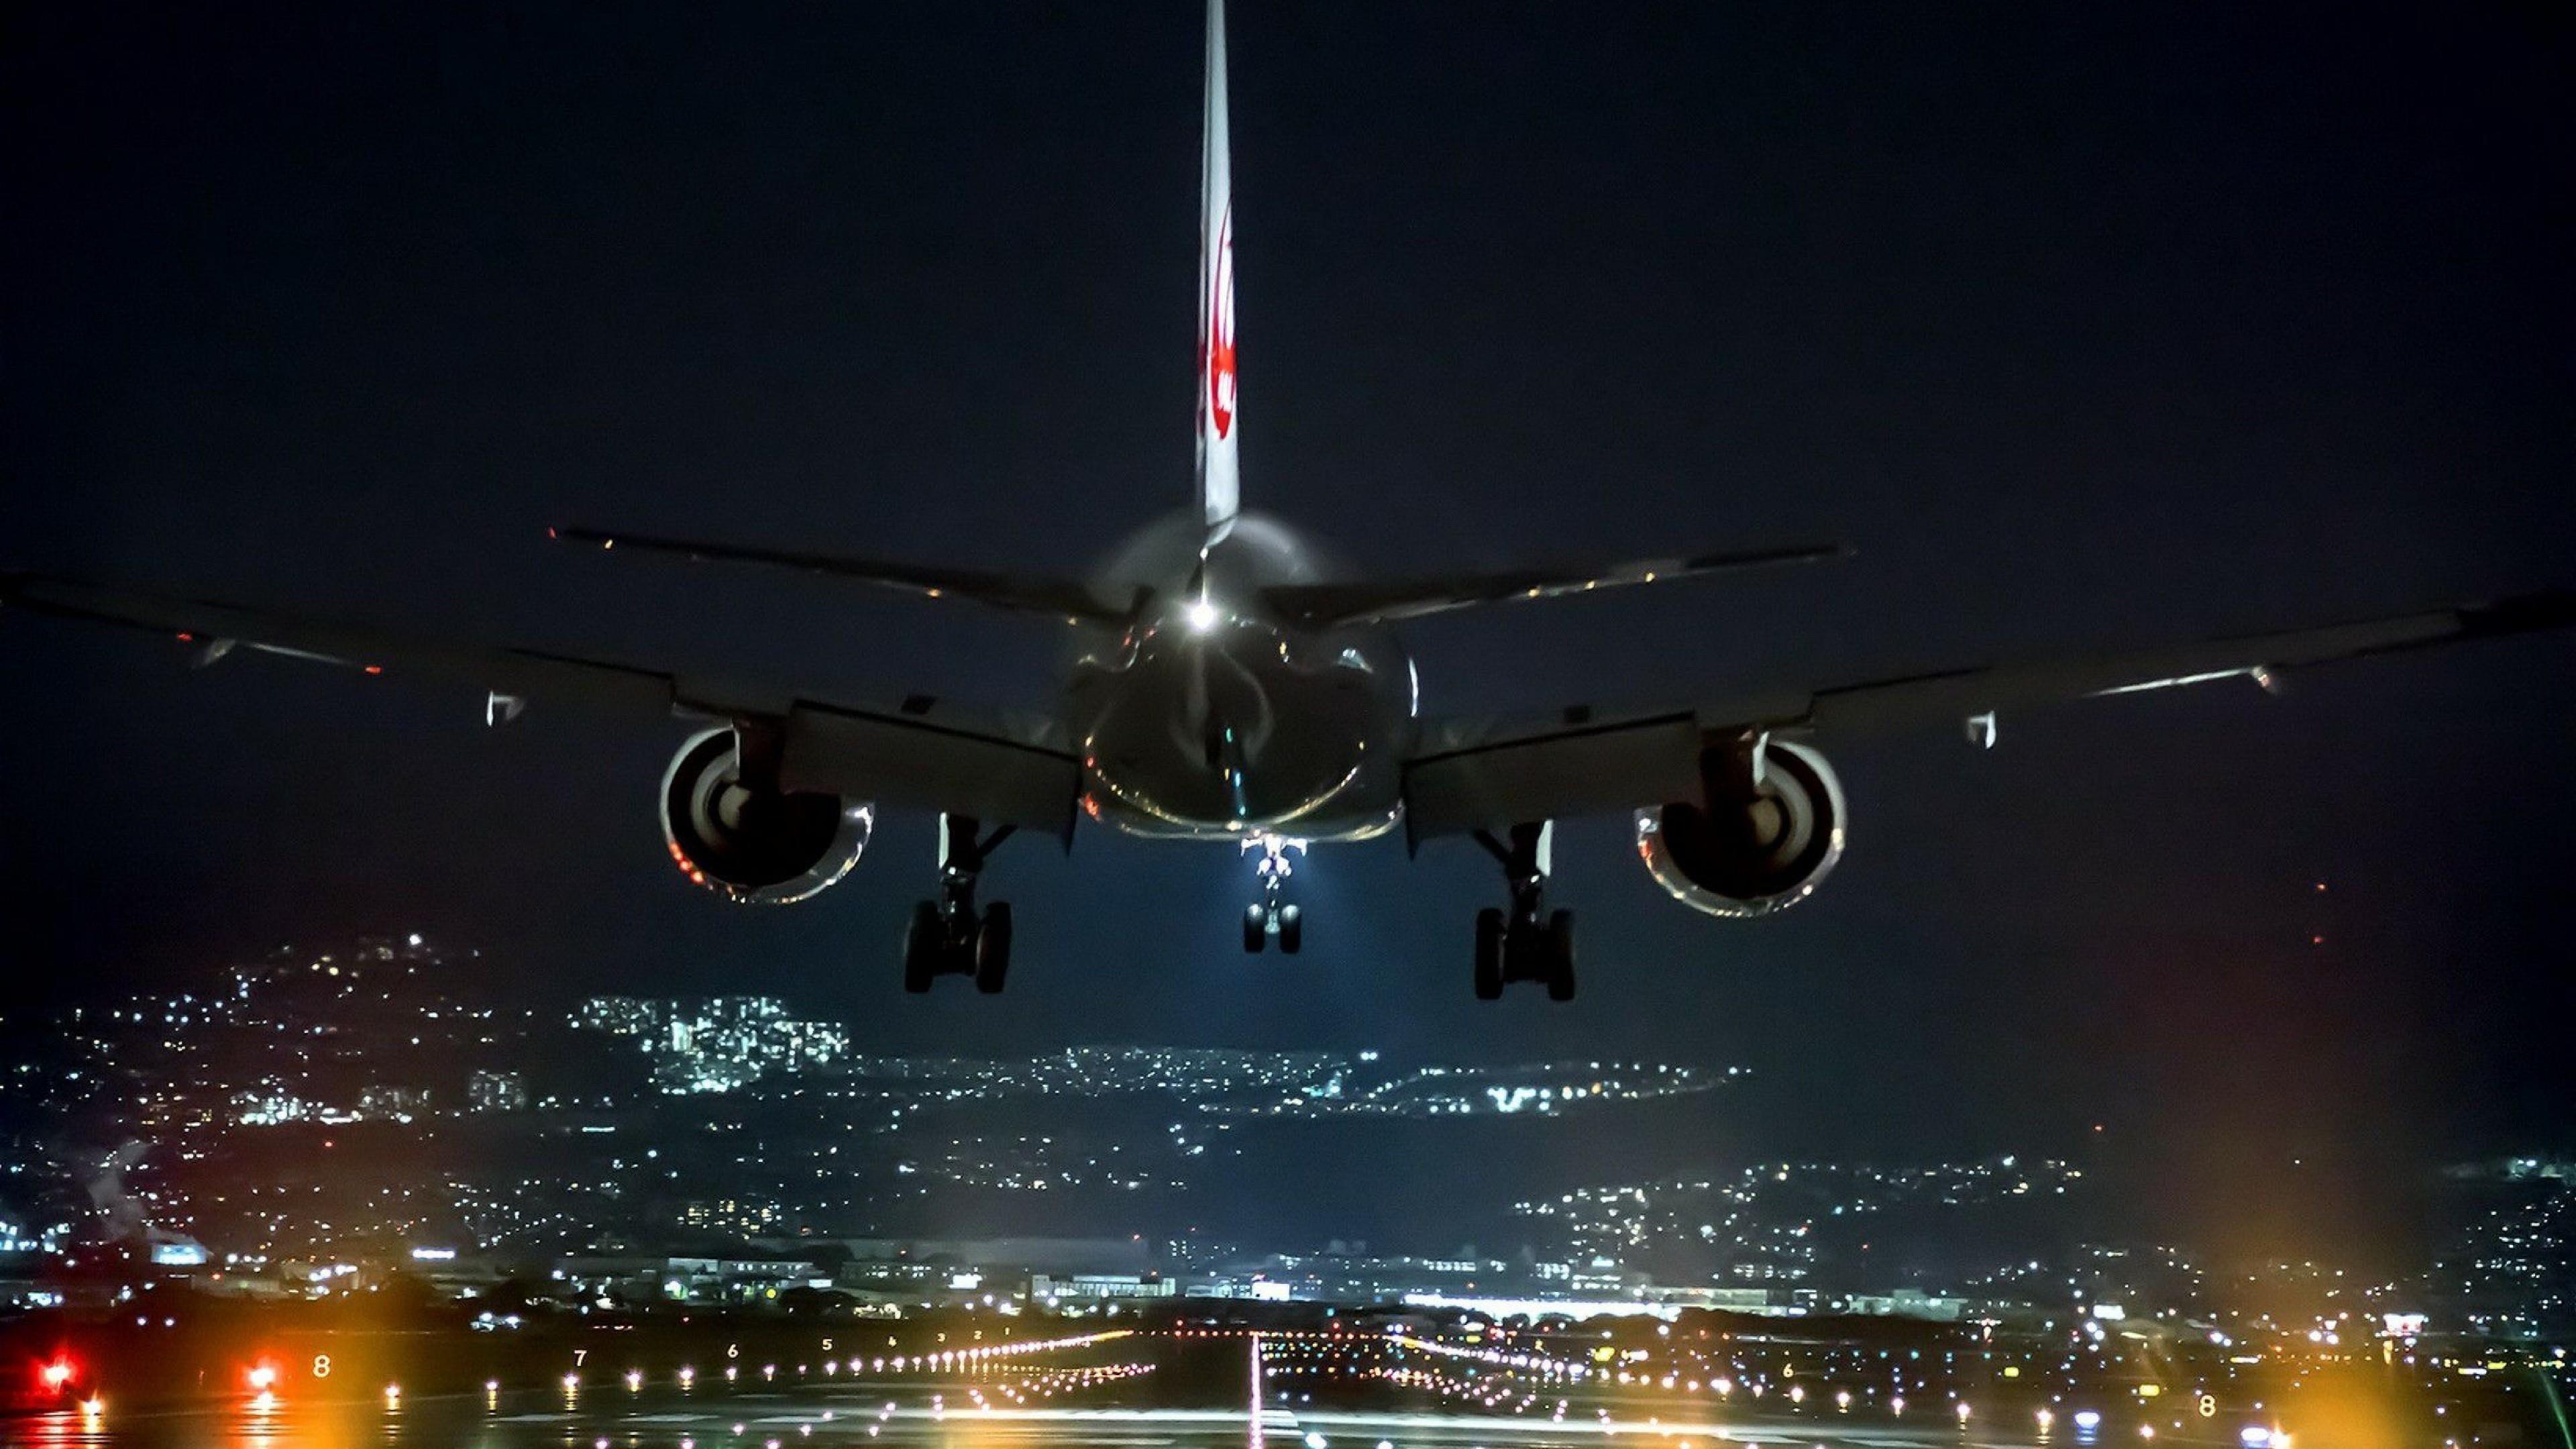 Airplane Night Flight Airline Air Travel Aviation Airliner Sky Landing Aircraft Airbus 4k Wallpaper Hdwallpaper Desktop